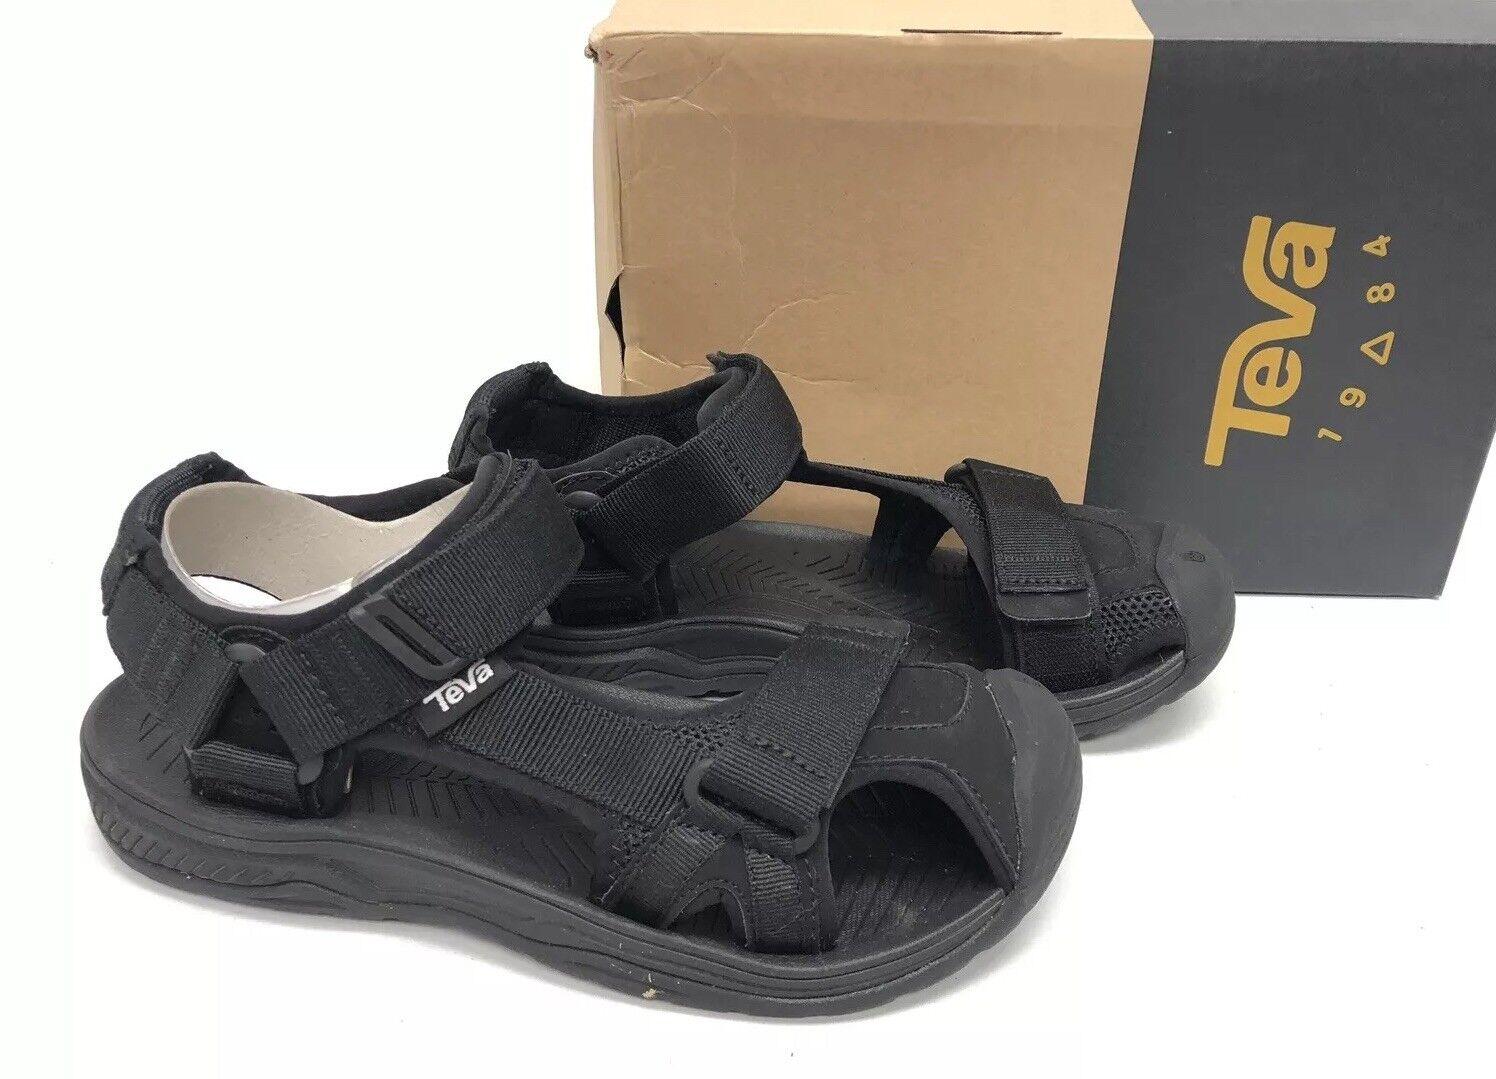 TEVA HURRICANE TOE PRO 2 BLACK STRAPPY SPORT SANDALS Men's Hiking Shoe